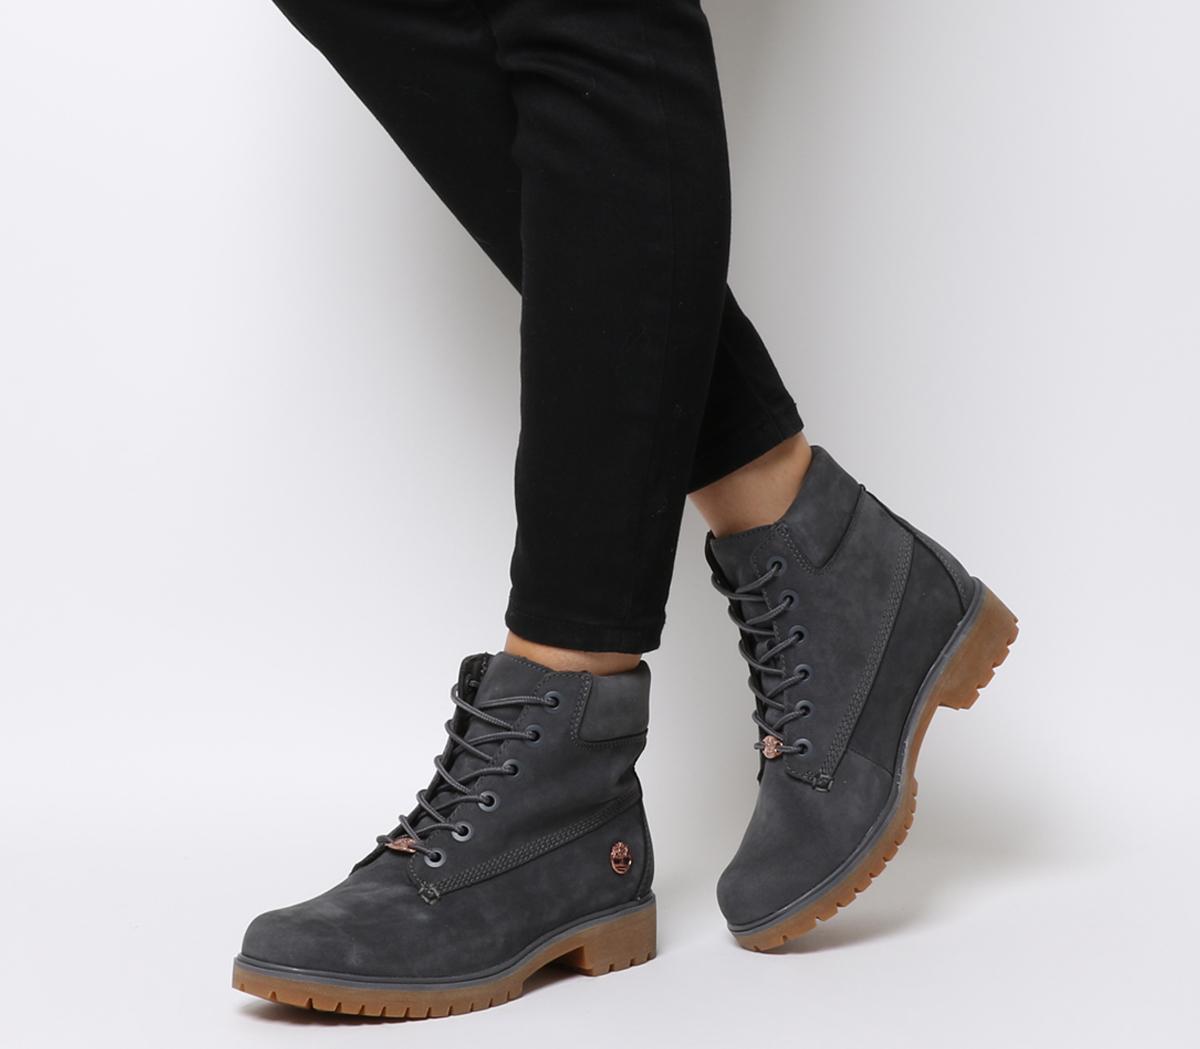 timberland slim 6 inch boots